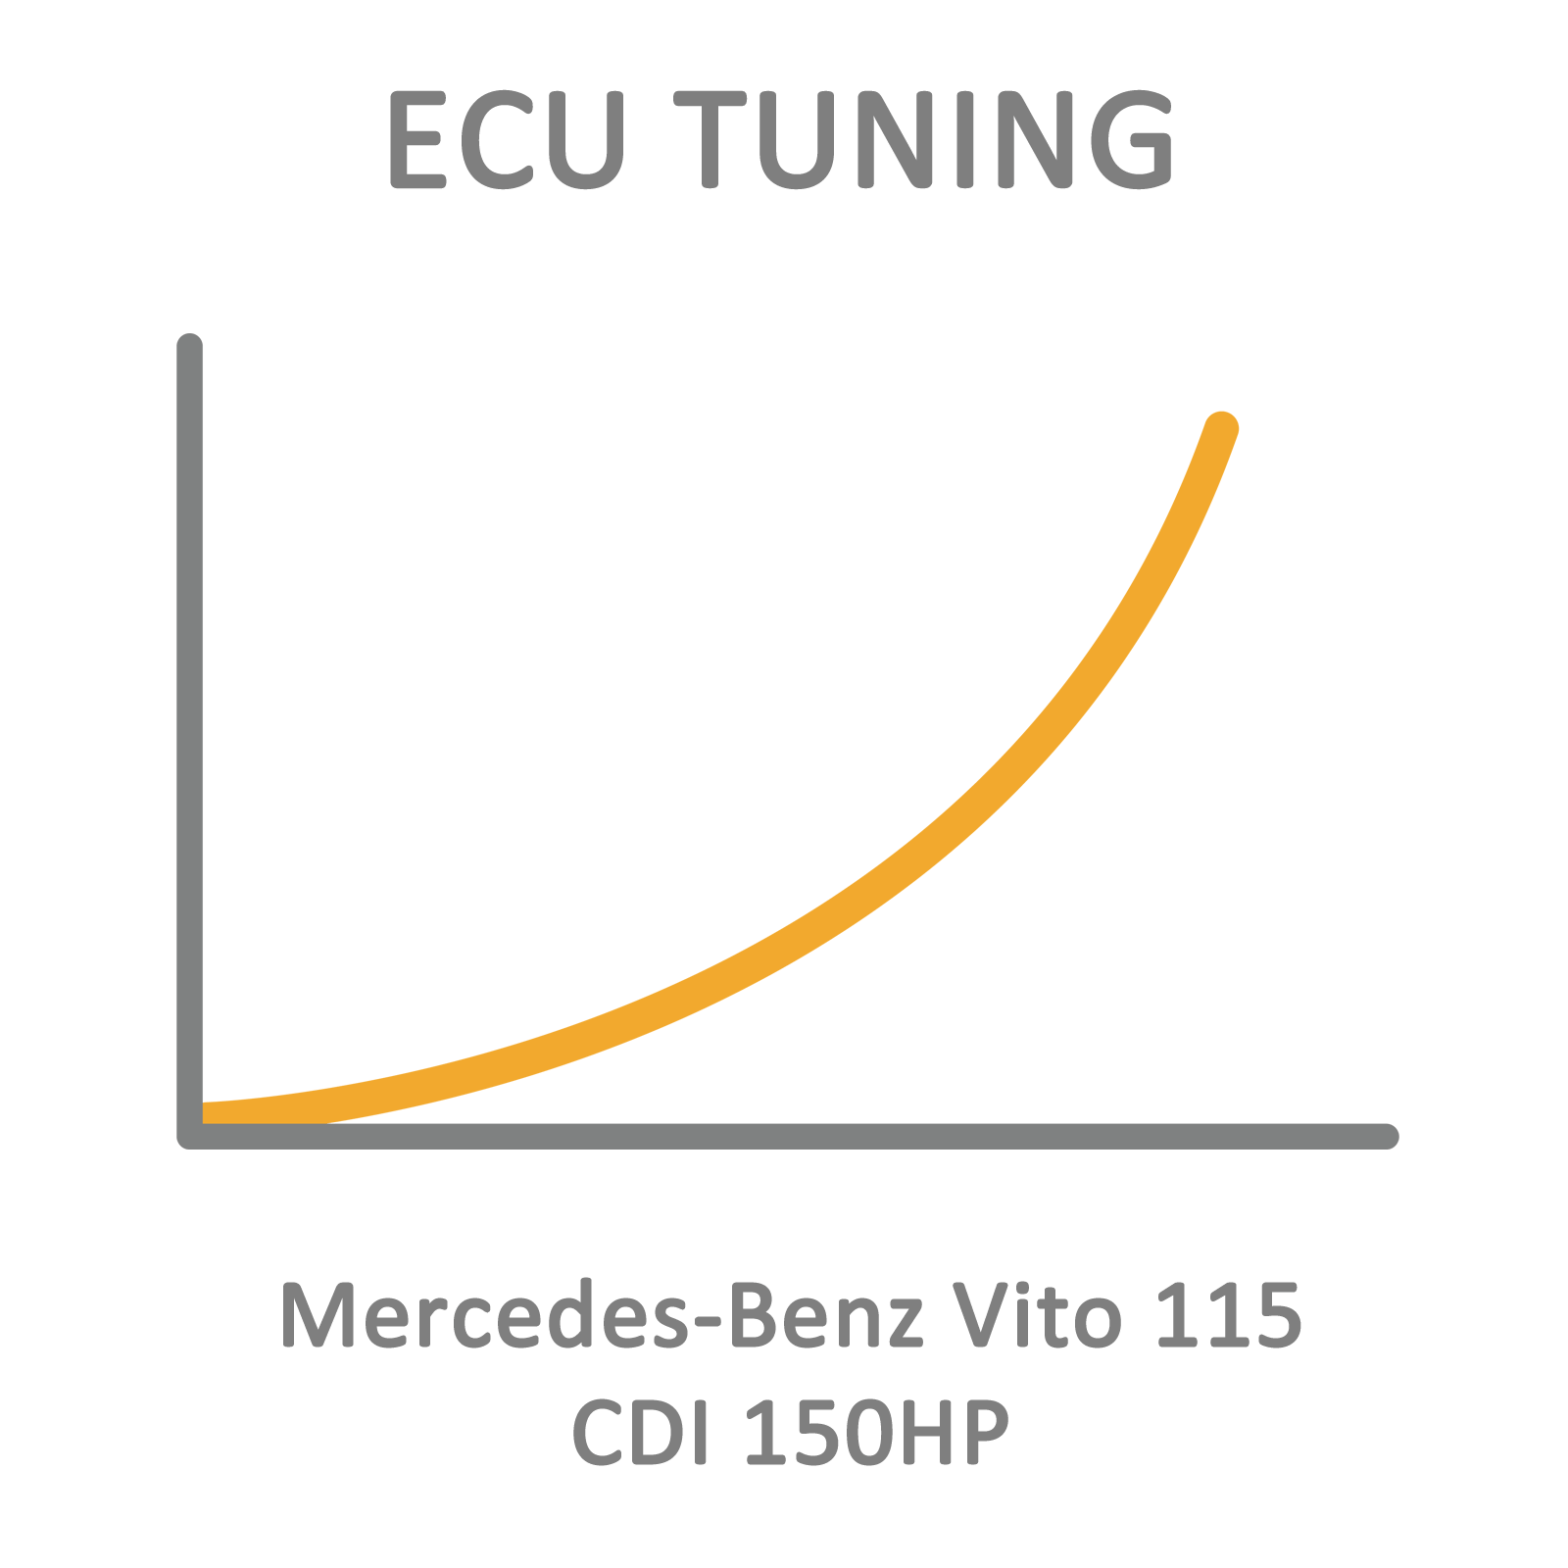 Mercedes-Benz Vito 115 CDI 150HP ECU Tuning Remapping